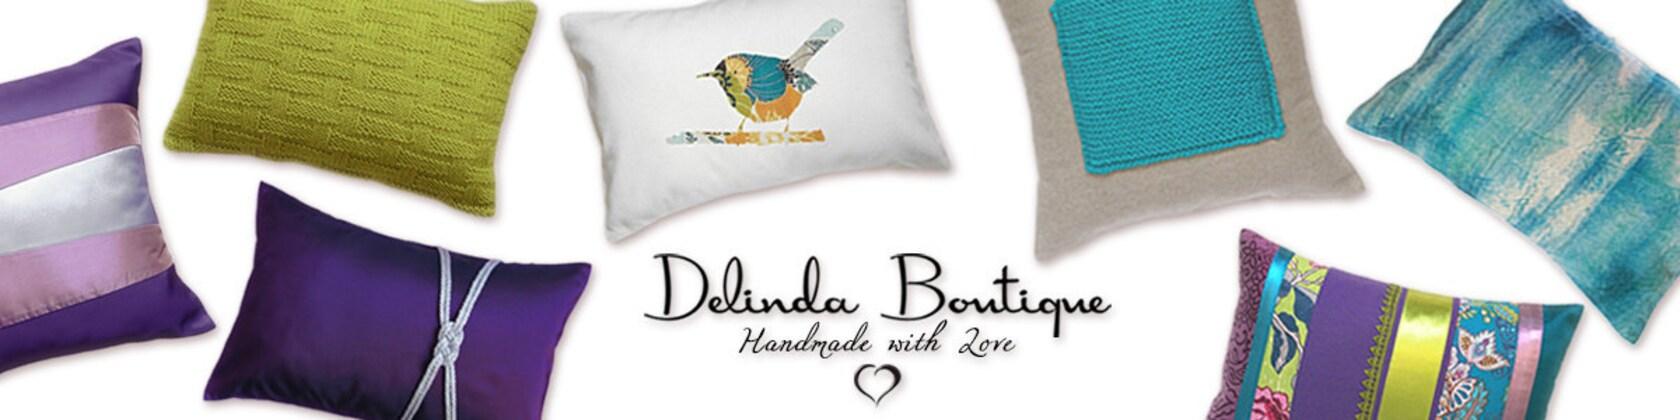 Decorative Pillows Sewing Patterns : Decorative Pillows PDF Bag Sewing Patterns by DelindaBoutique